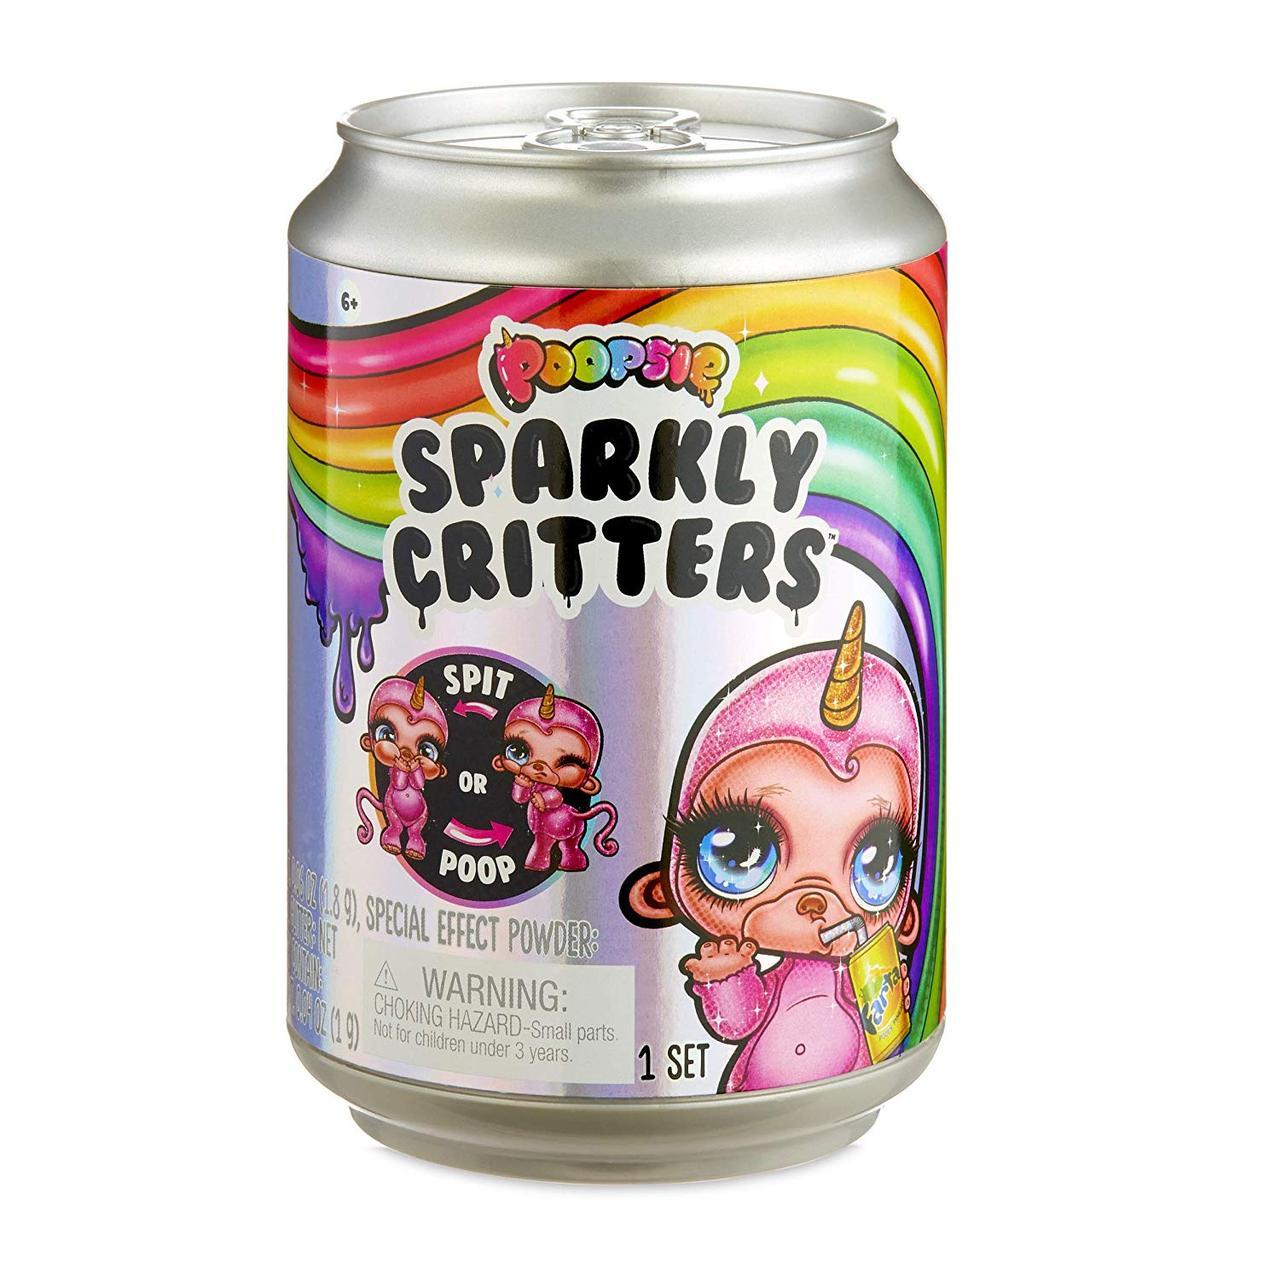 Игровой набор Poopsie Волшебный Питомец с сюрпризом слайм в банке Poopsie Sparkly Critters That Magically